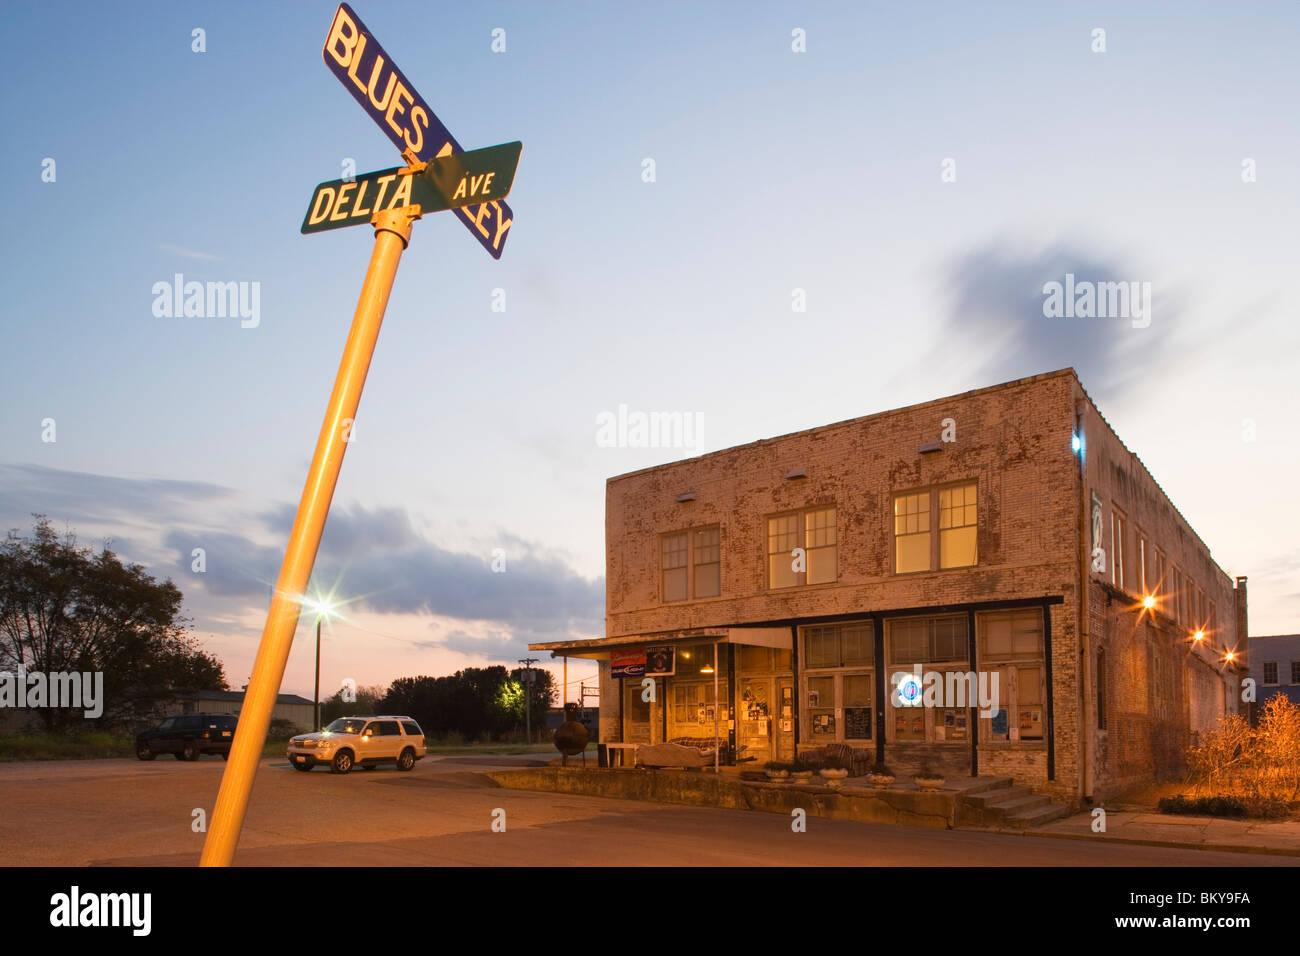 61 Stock Photos & 61 Stock Images - Alamy